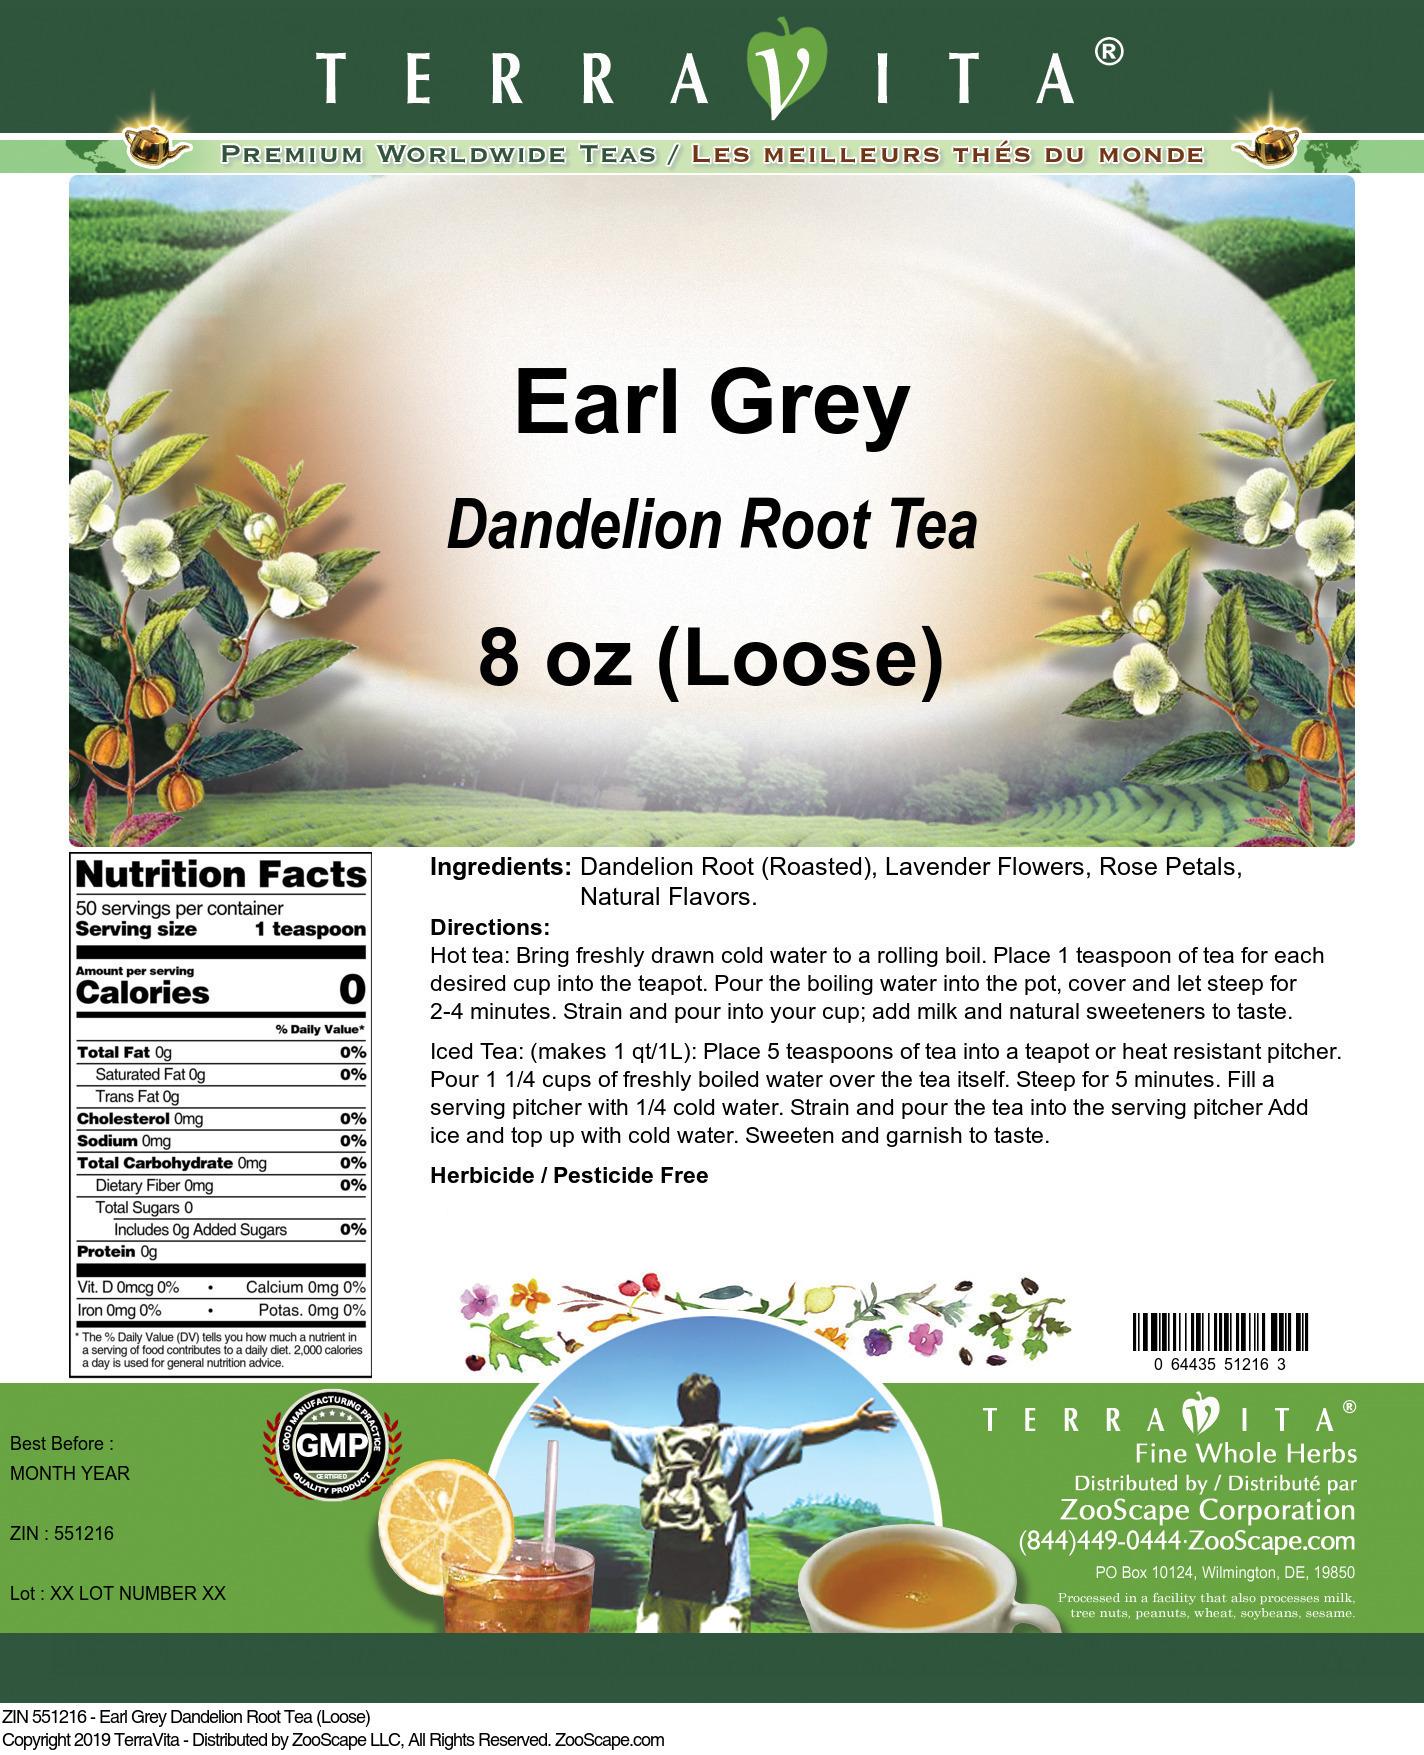 Earl Grey Dandelion Root Tea (Loose)